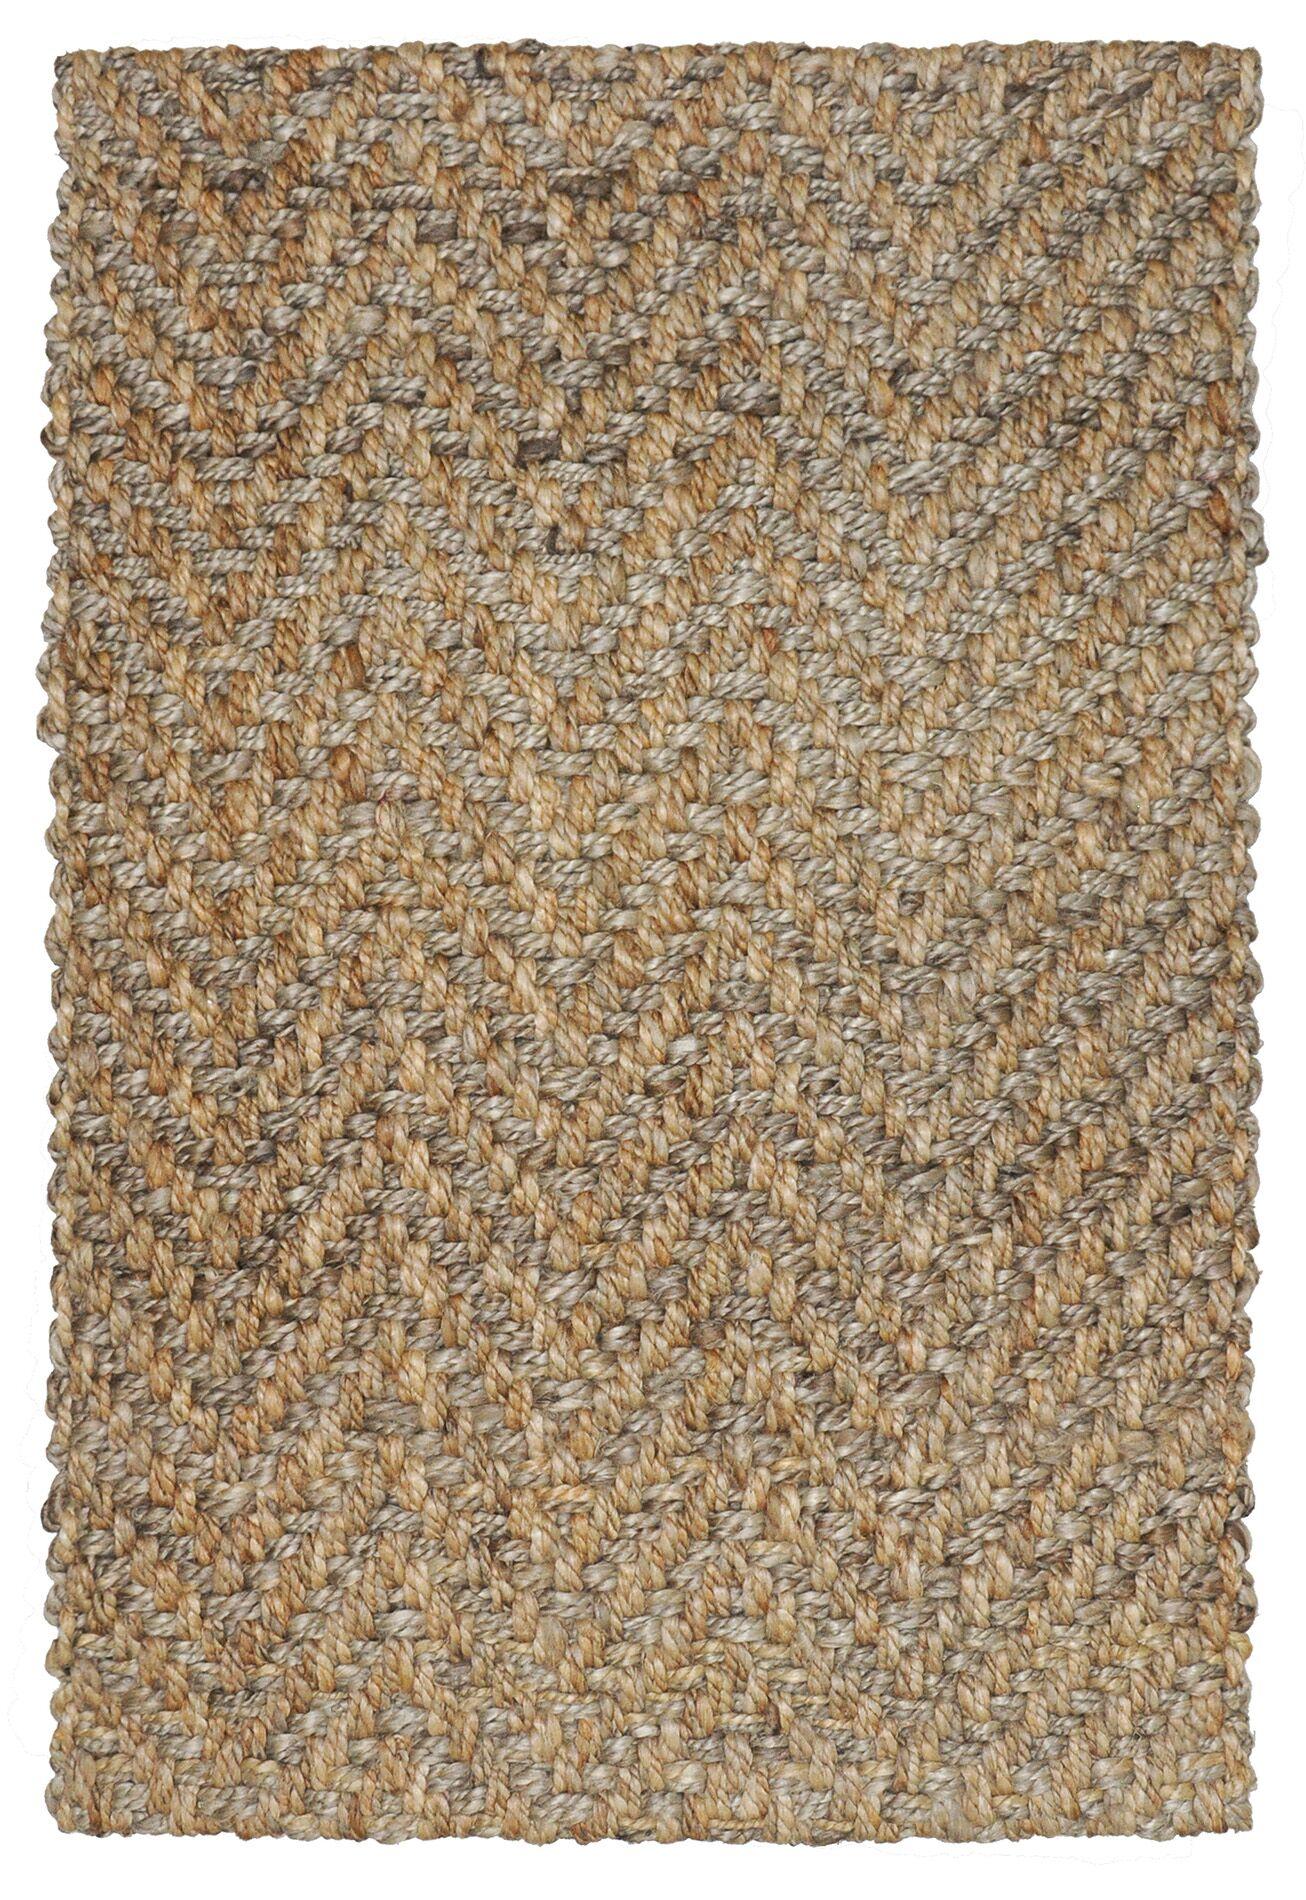 Shayla Hand-Woven Brown Area Rug Rug Size: 5' x 8'